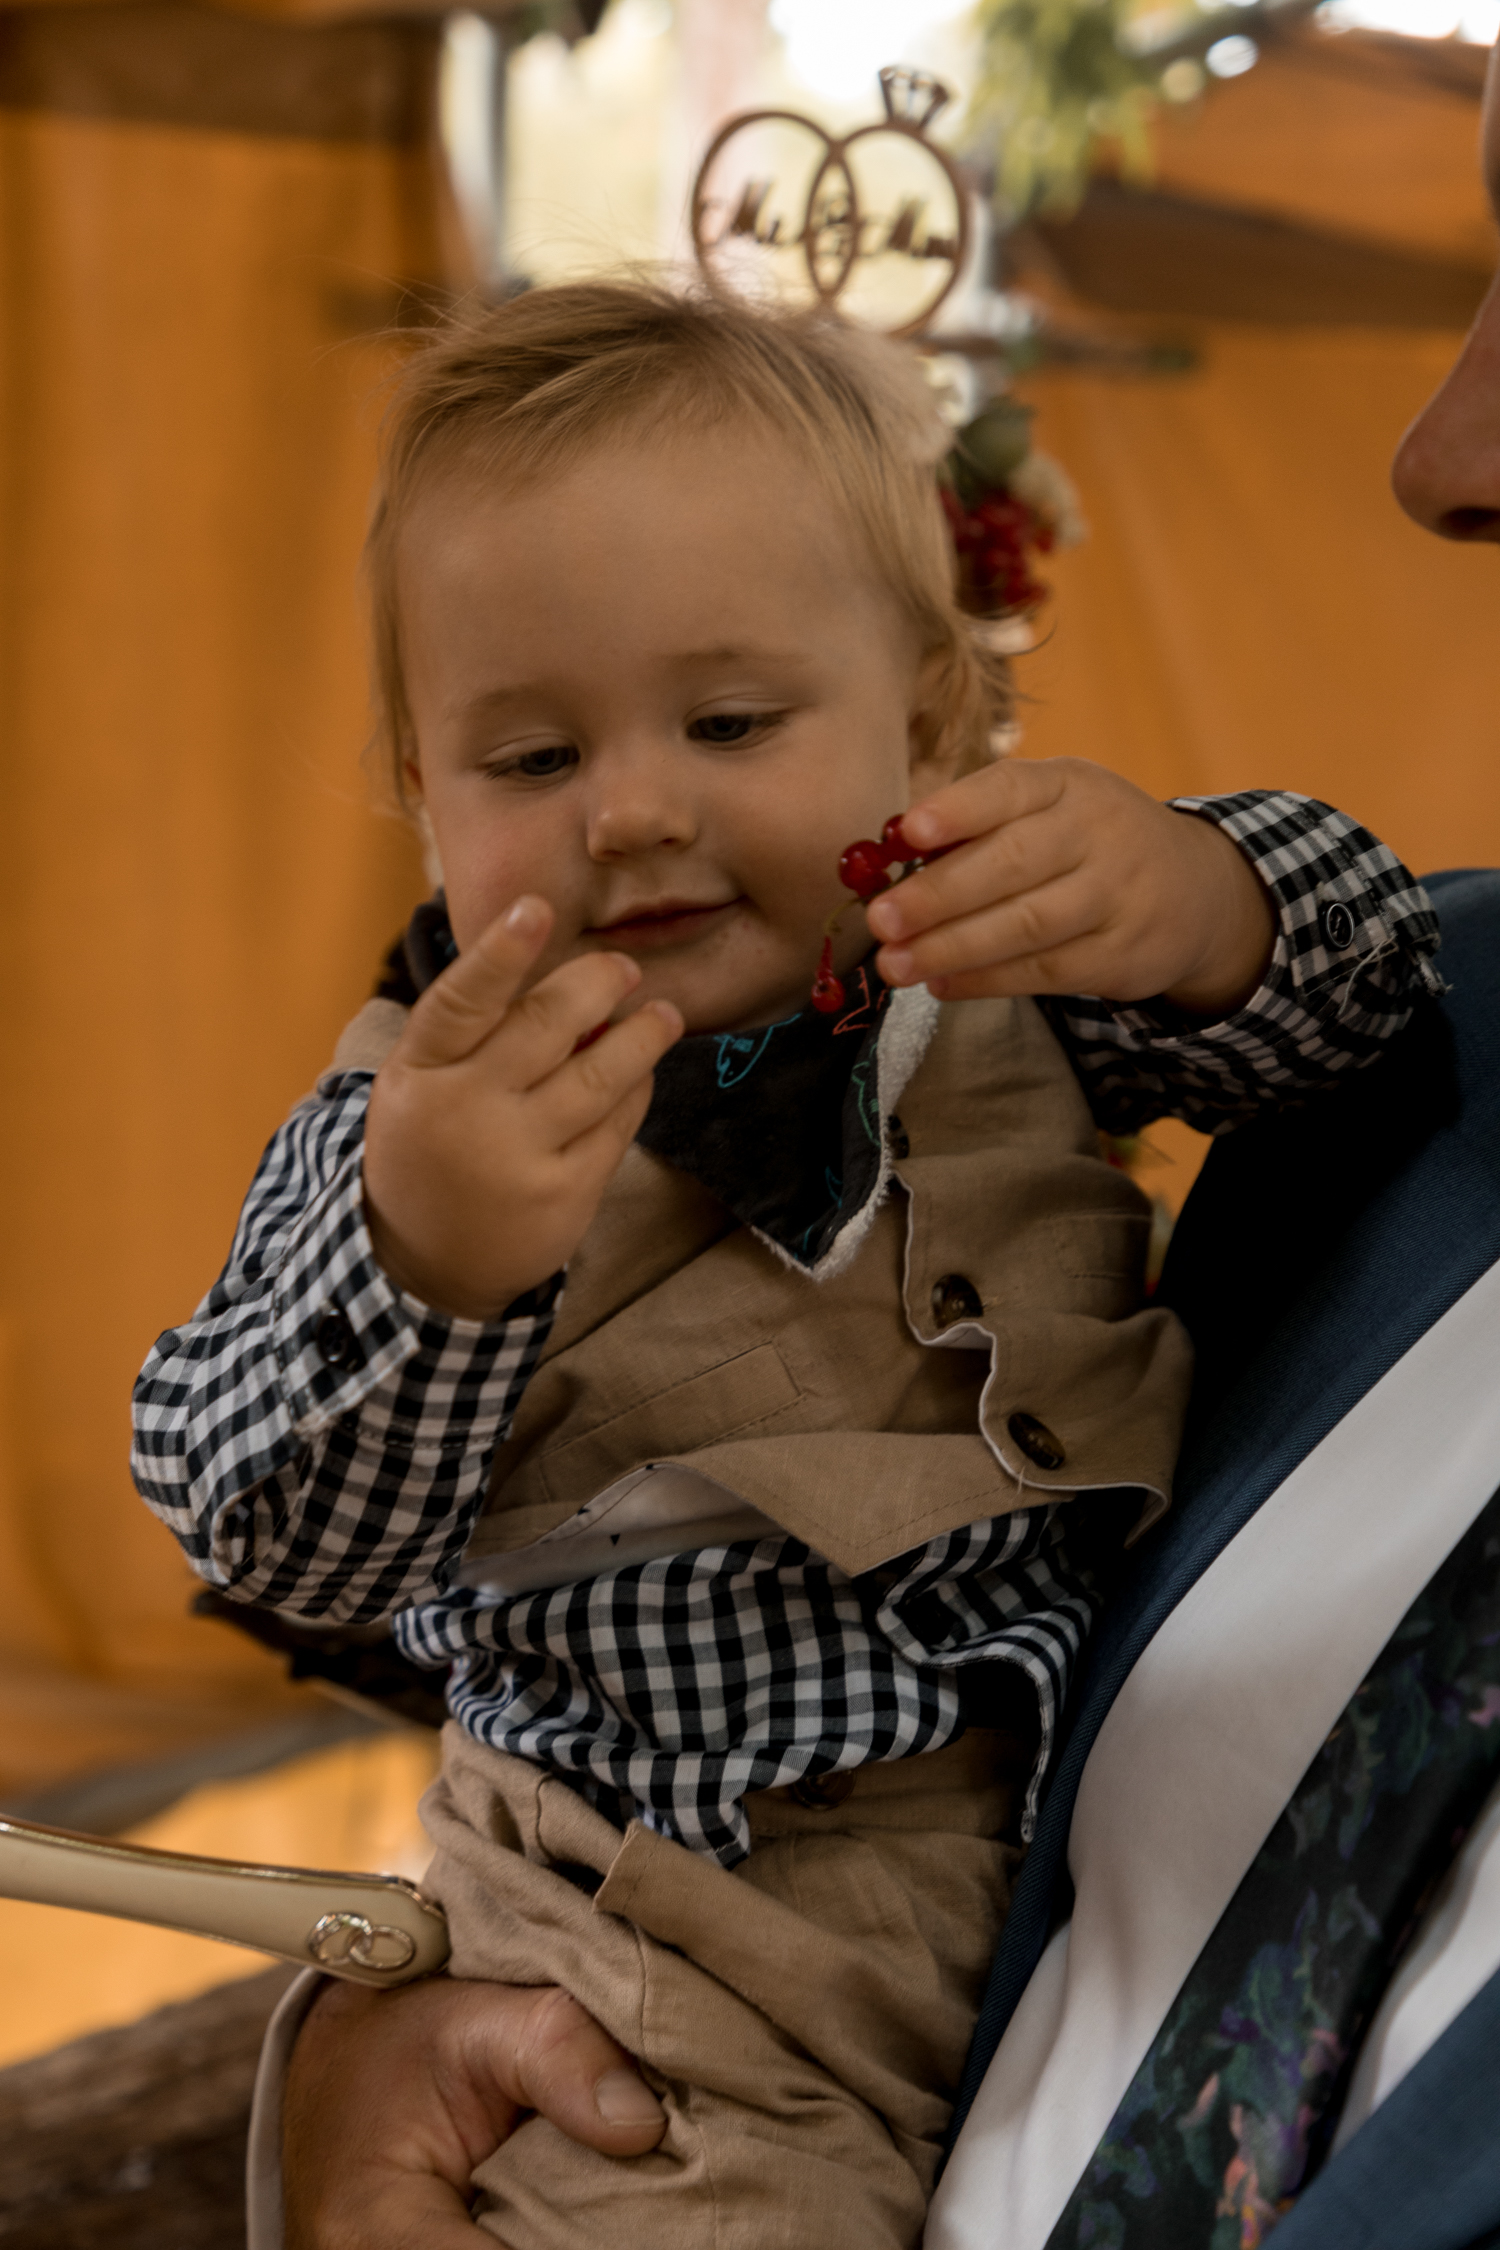 black-barn-winery-wedding-hawkes-bay-wedding-photographer-son-of-bride-and-groom-eating-cake.jpg